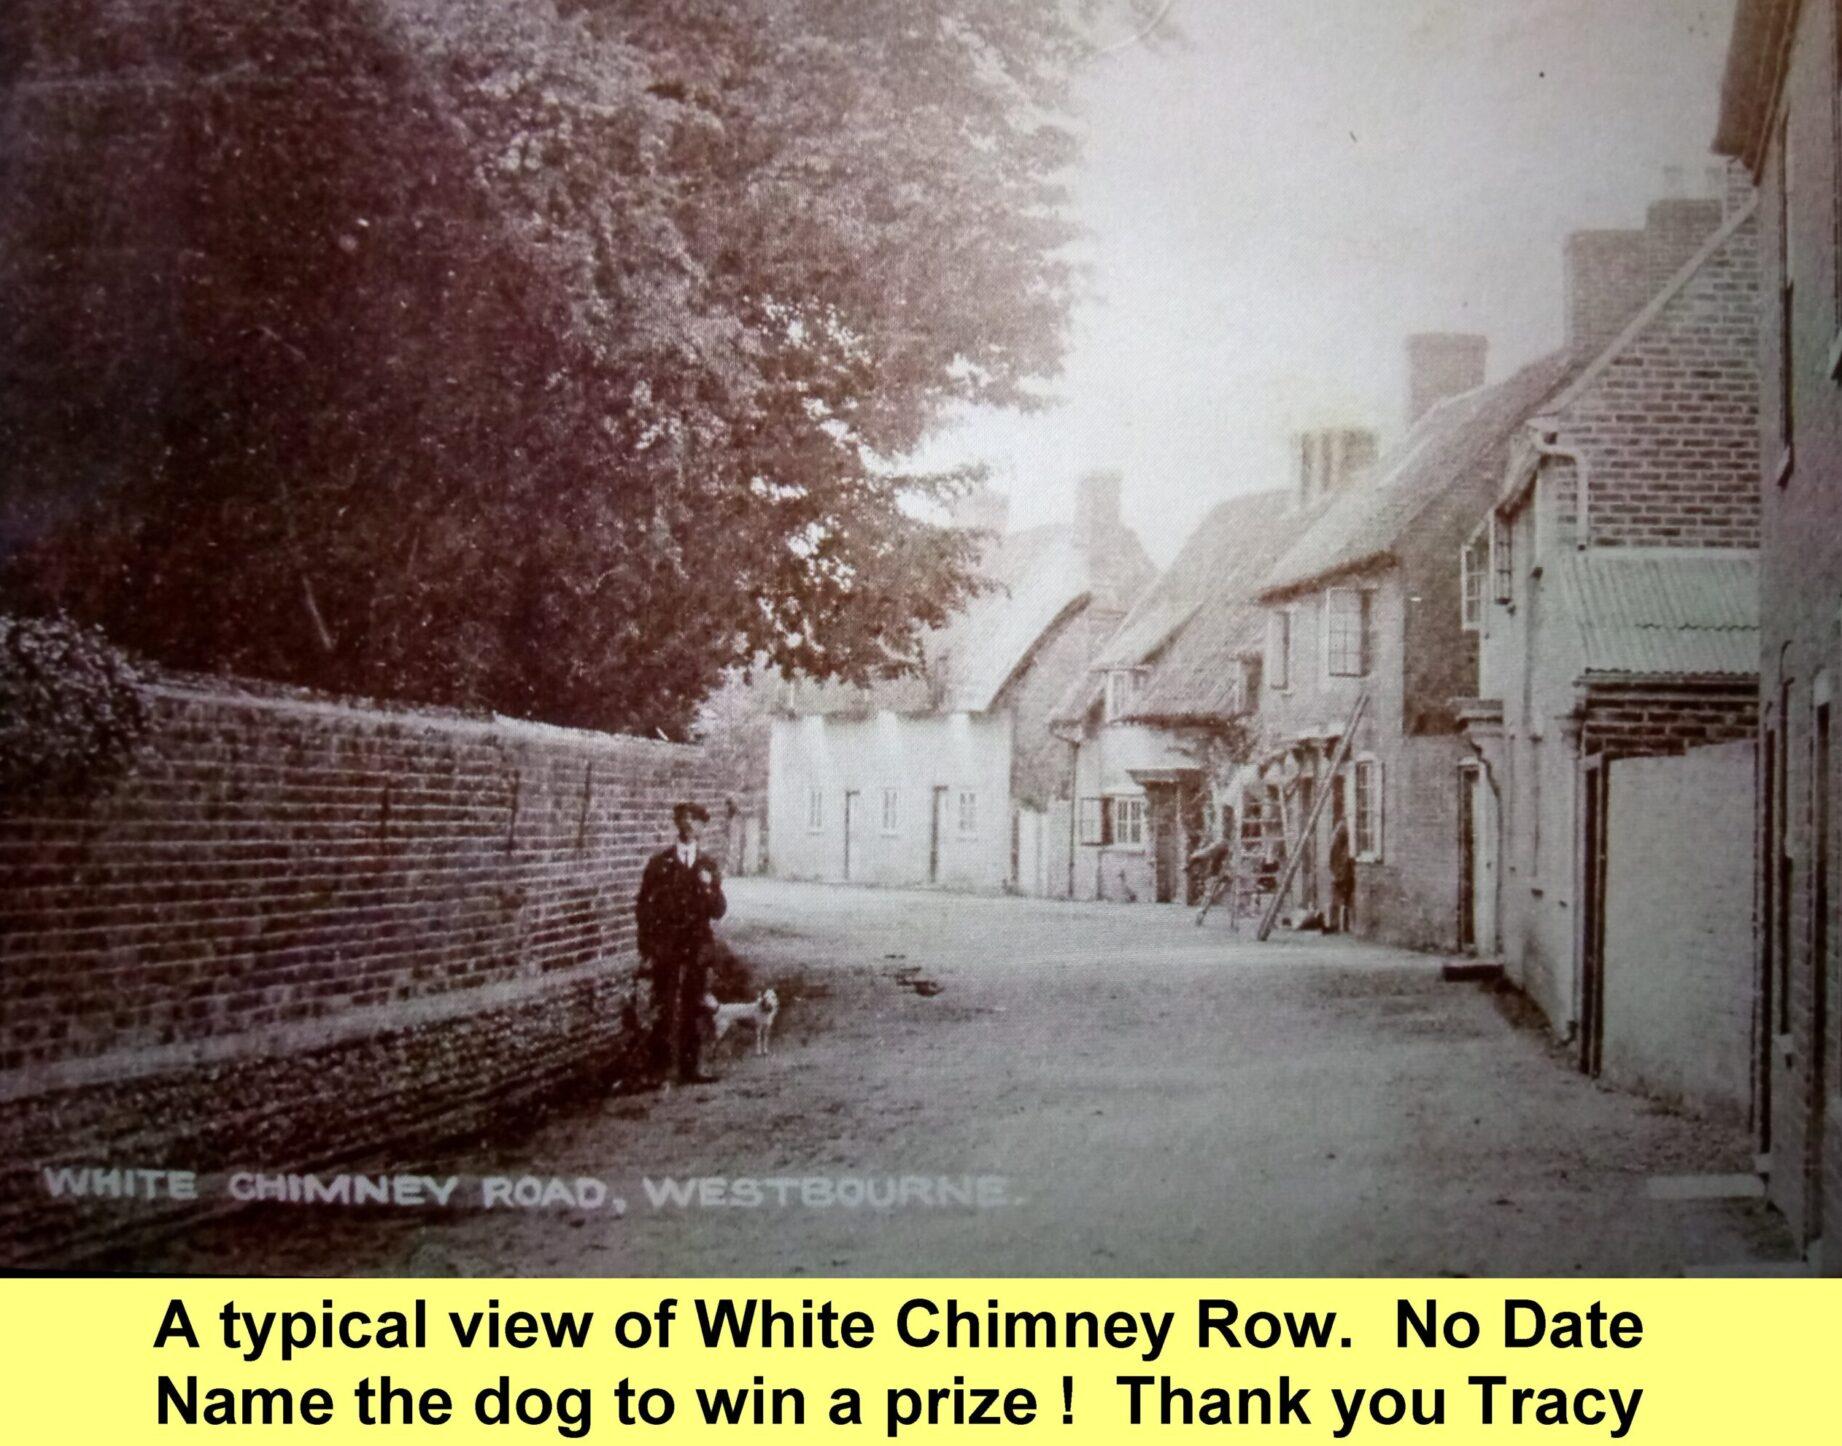 WESTBOURNE HISTORY PHOTO, WHITE CHIMNEY ROW, THATCH, WALNUT TREE, TIBBALDS